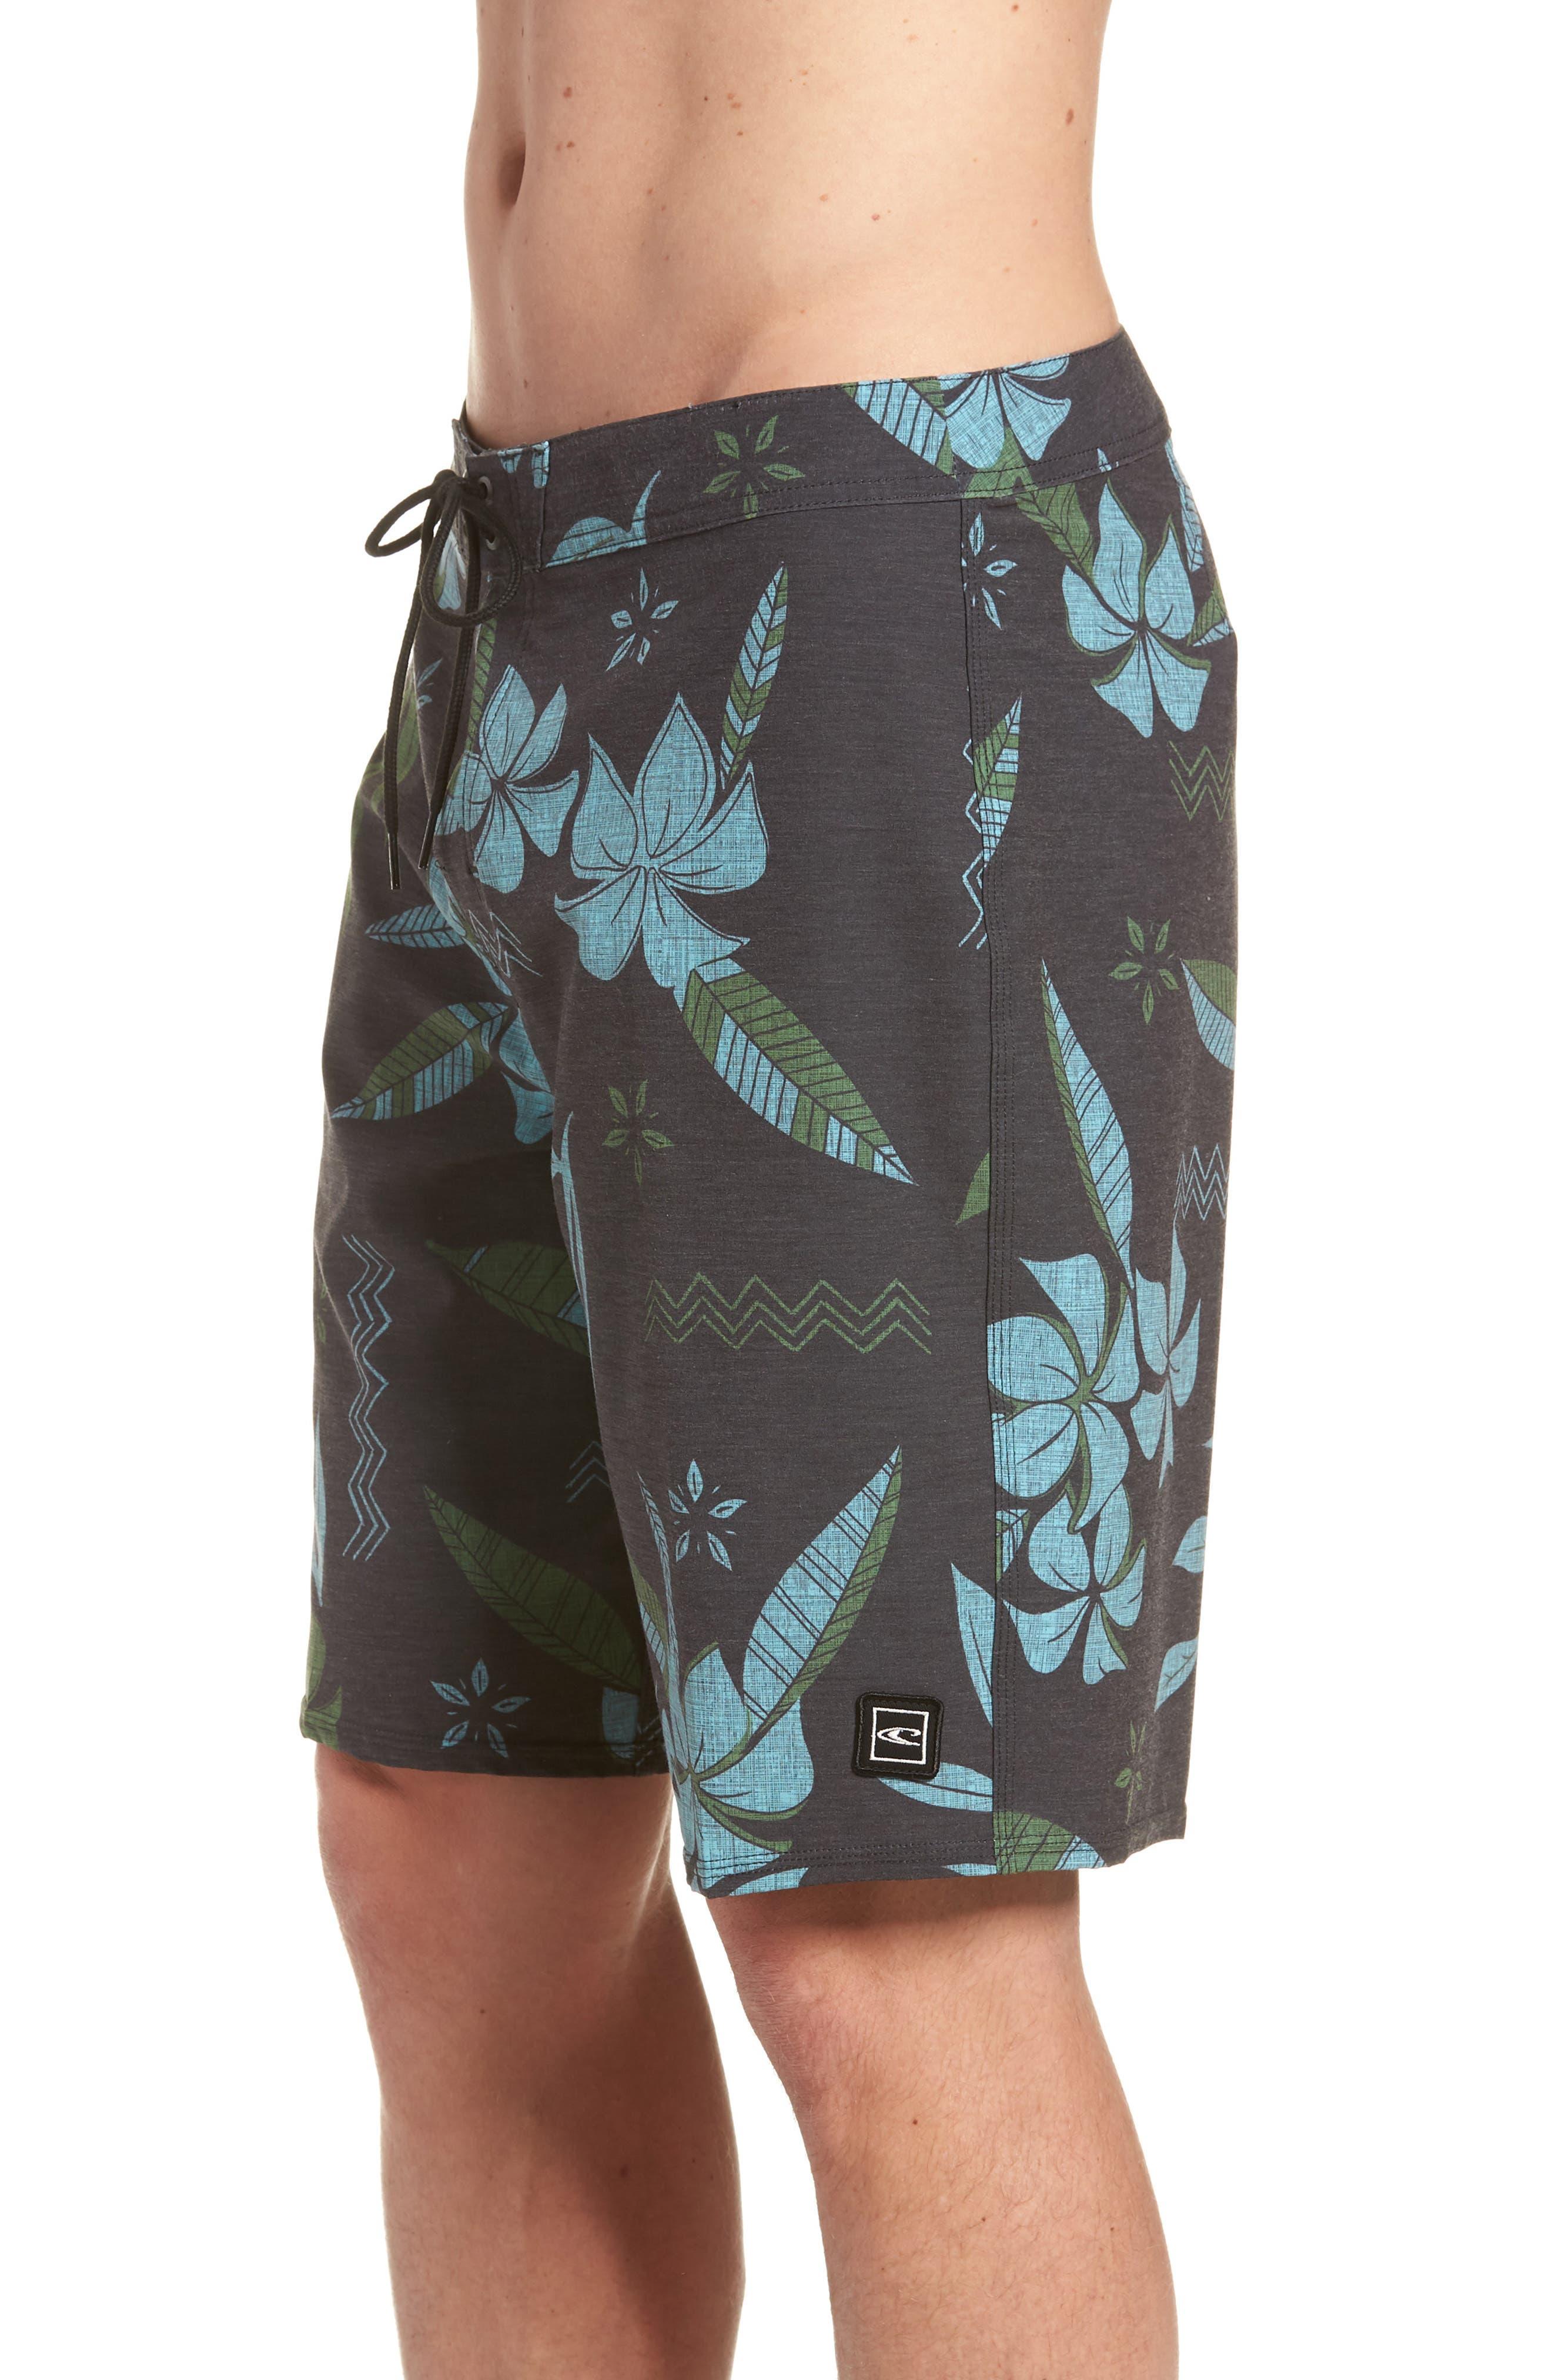 Maui Board Shorts,                             Alternate thumbnail 3, color,                             Black